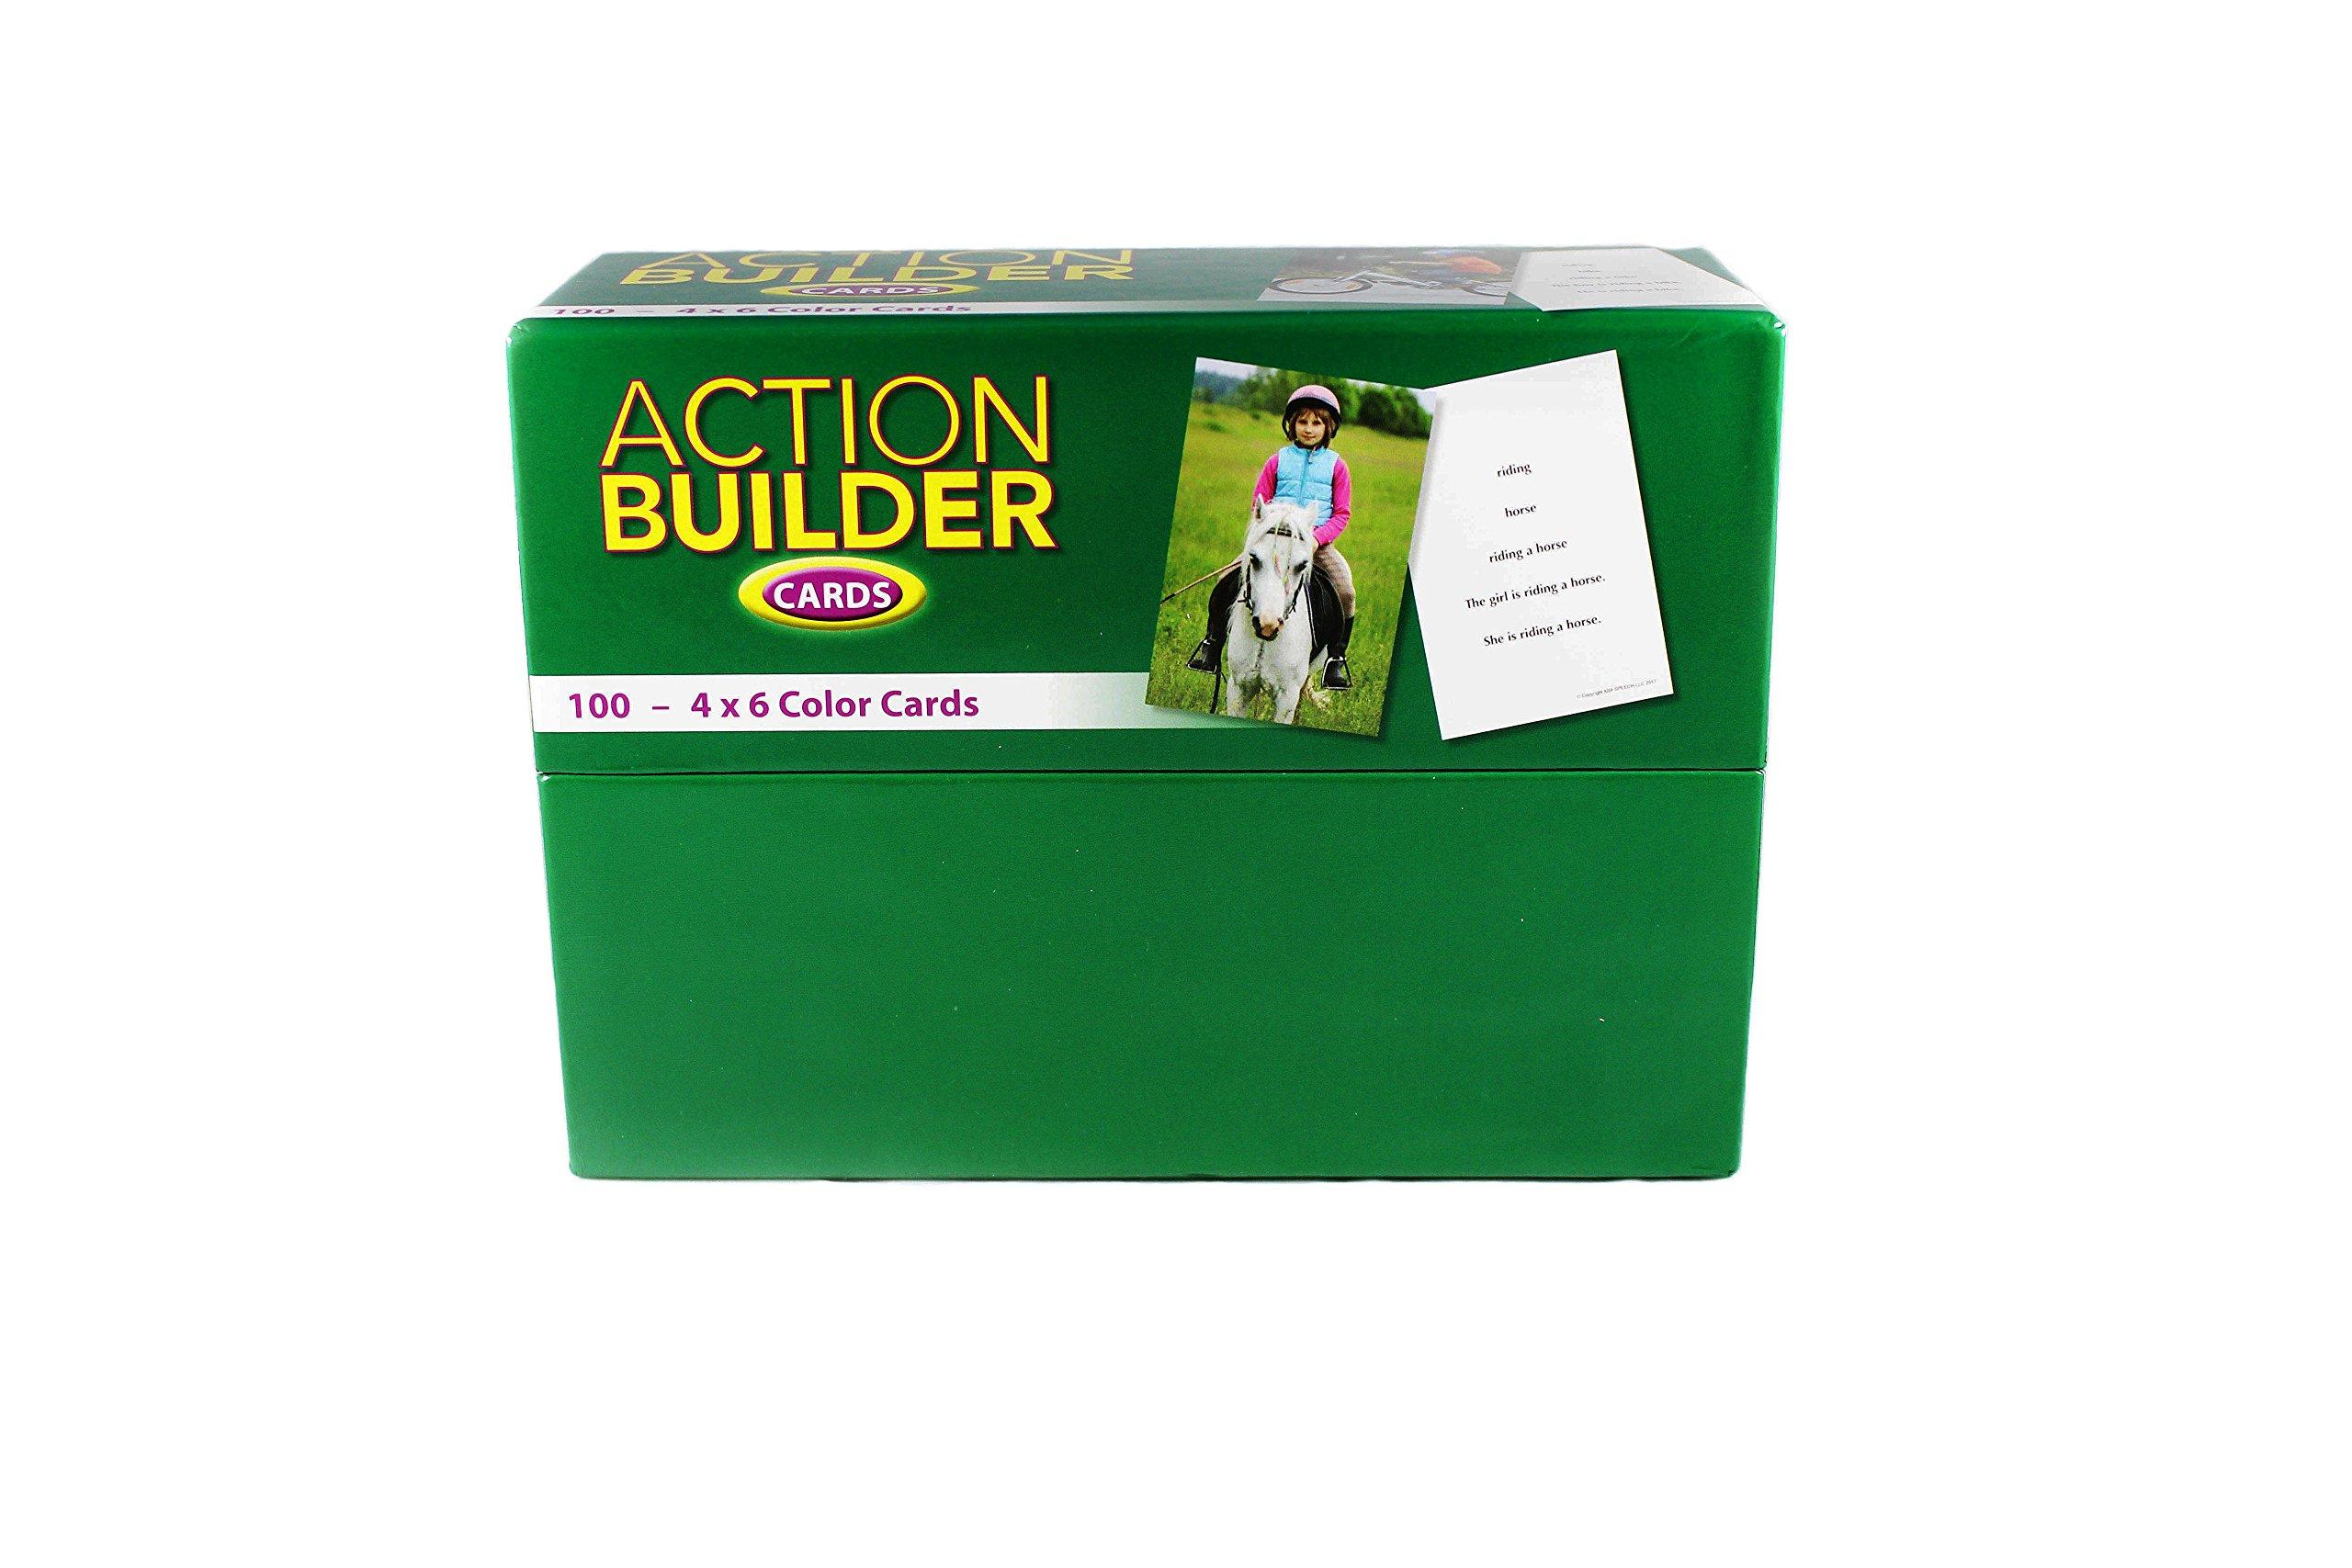 Action Builder Cards by Action Builder Cards